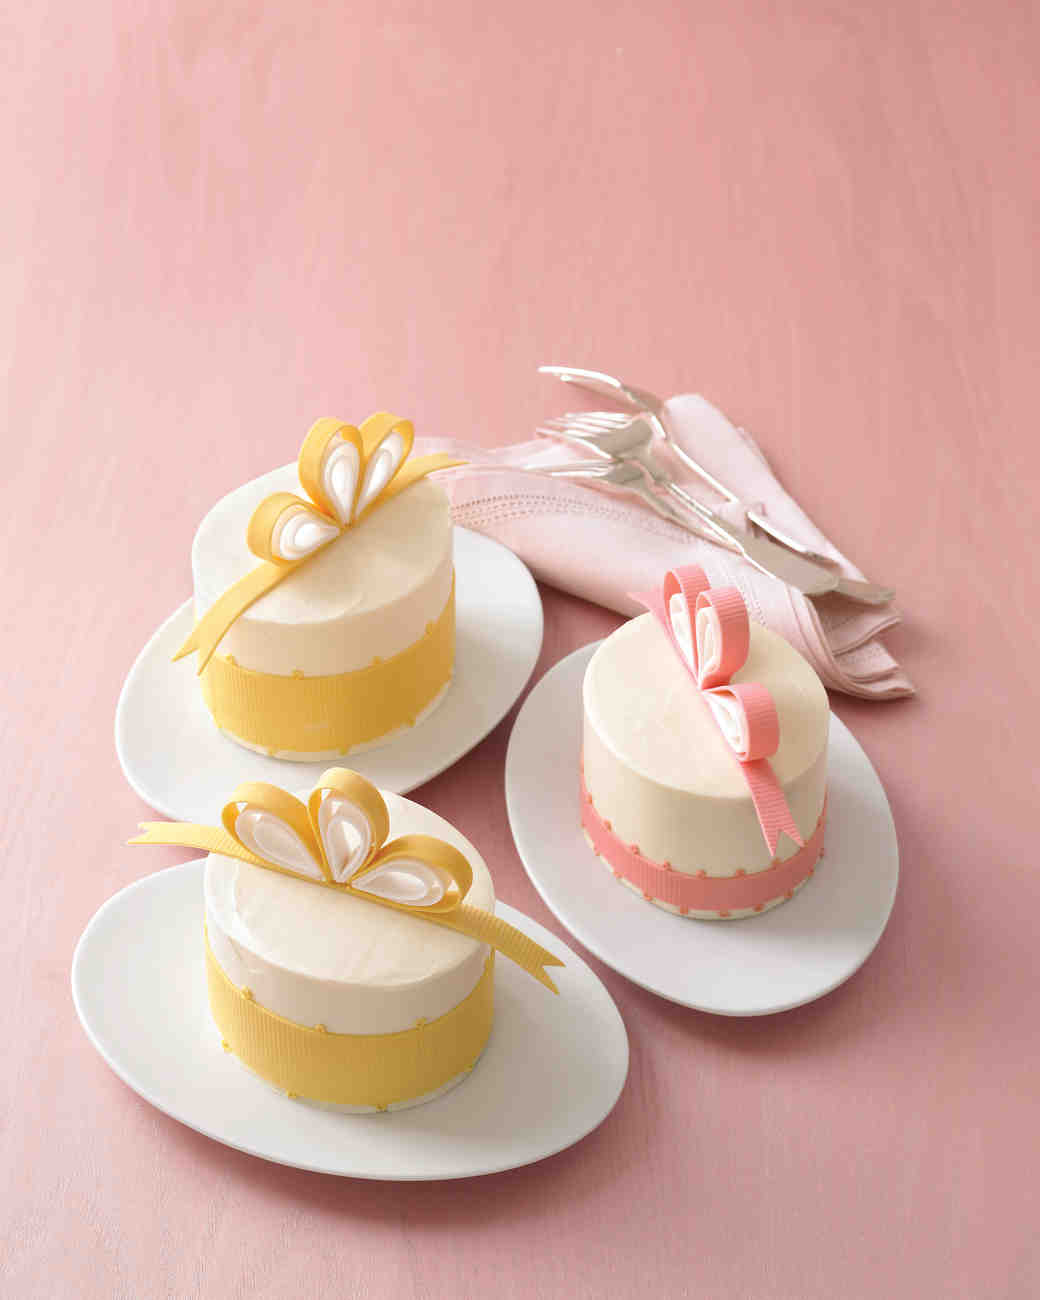 bow-cakes-mwd103633-mini-0515.jpg